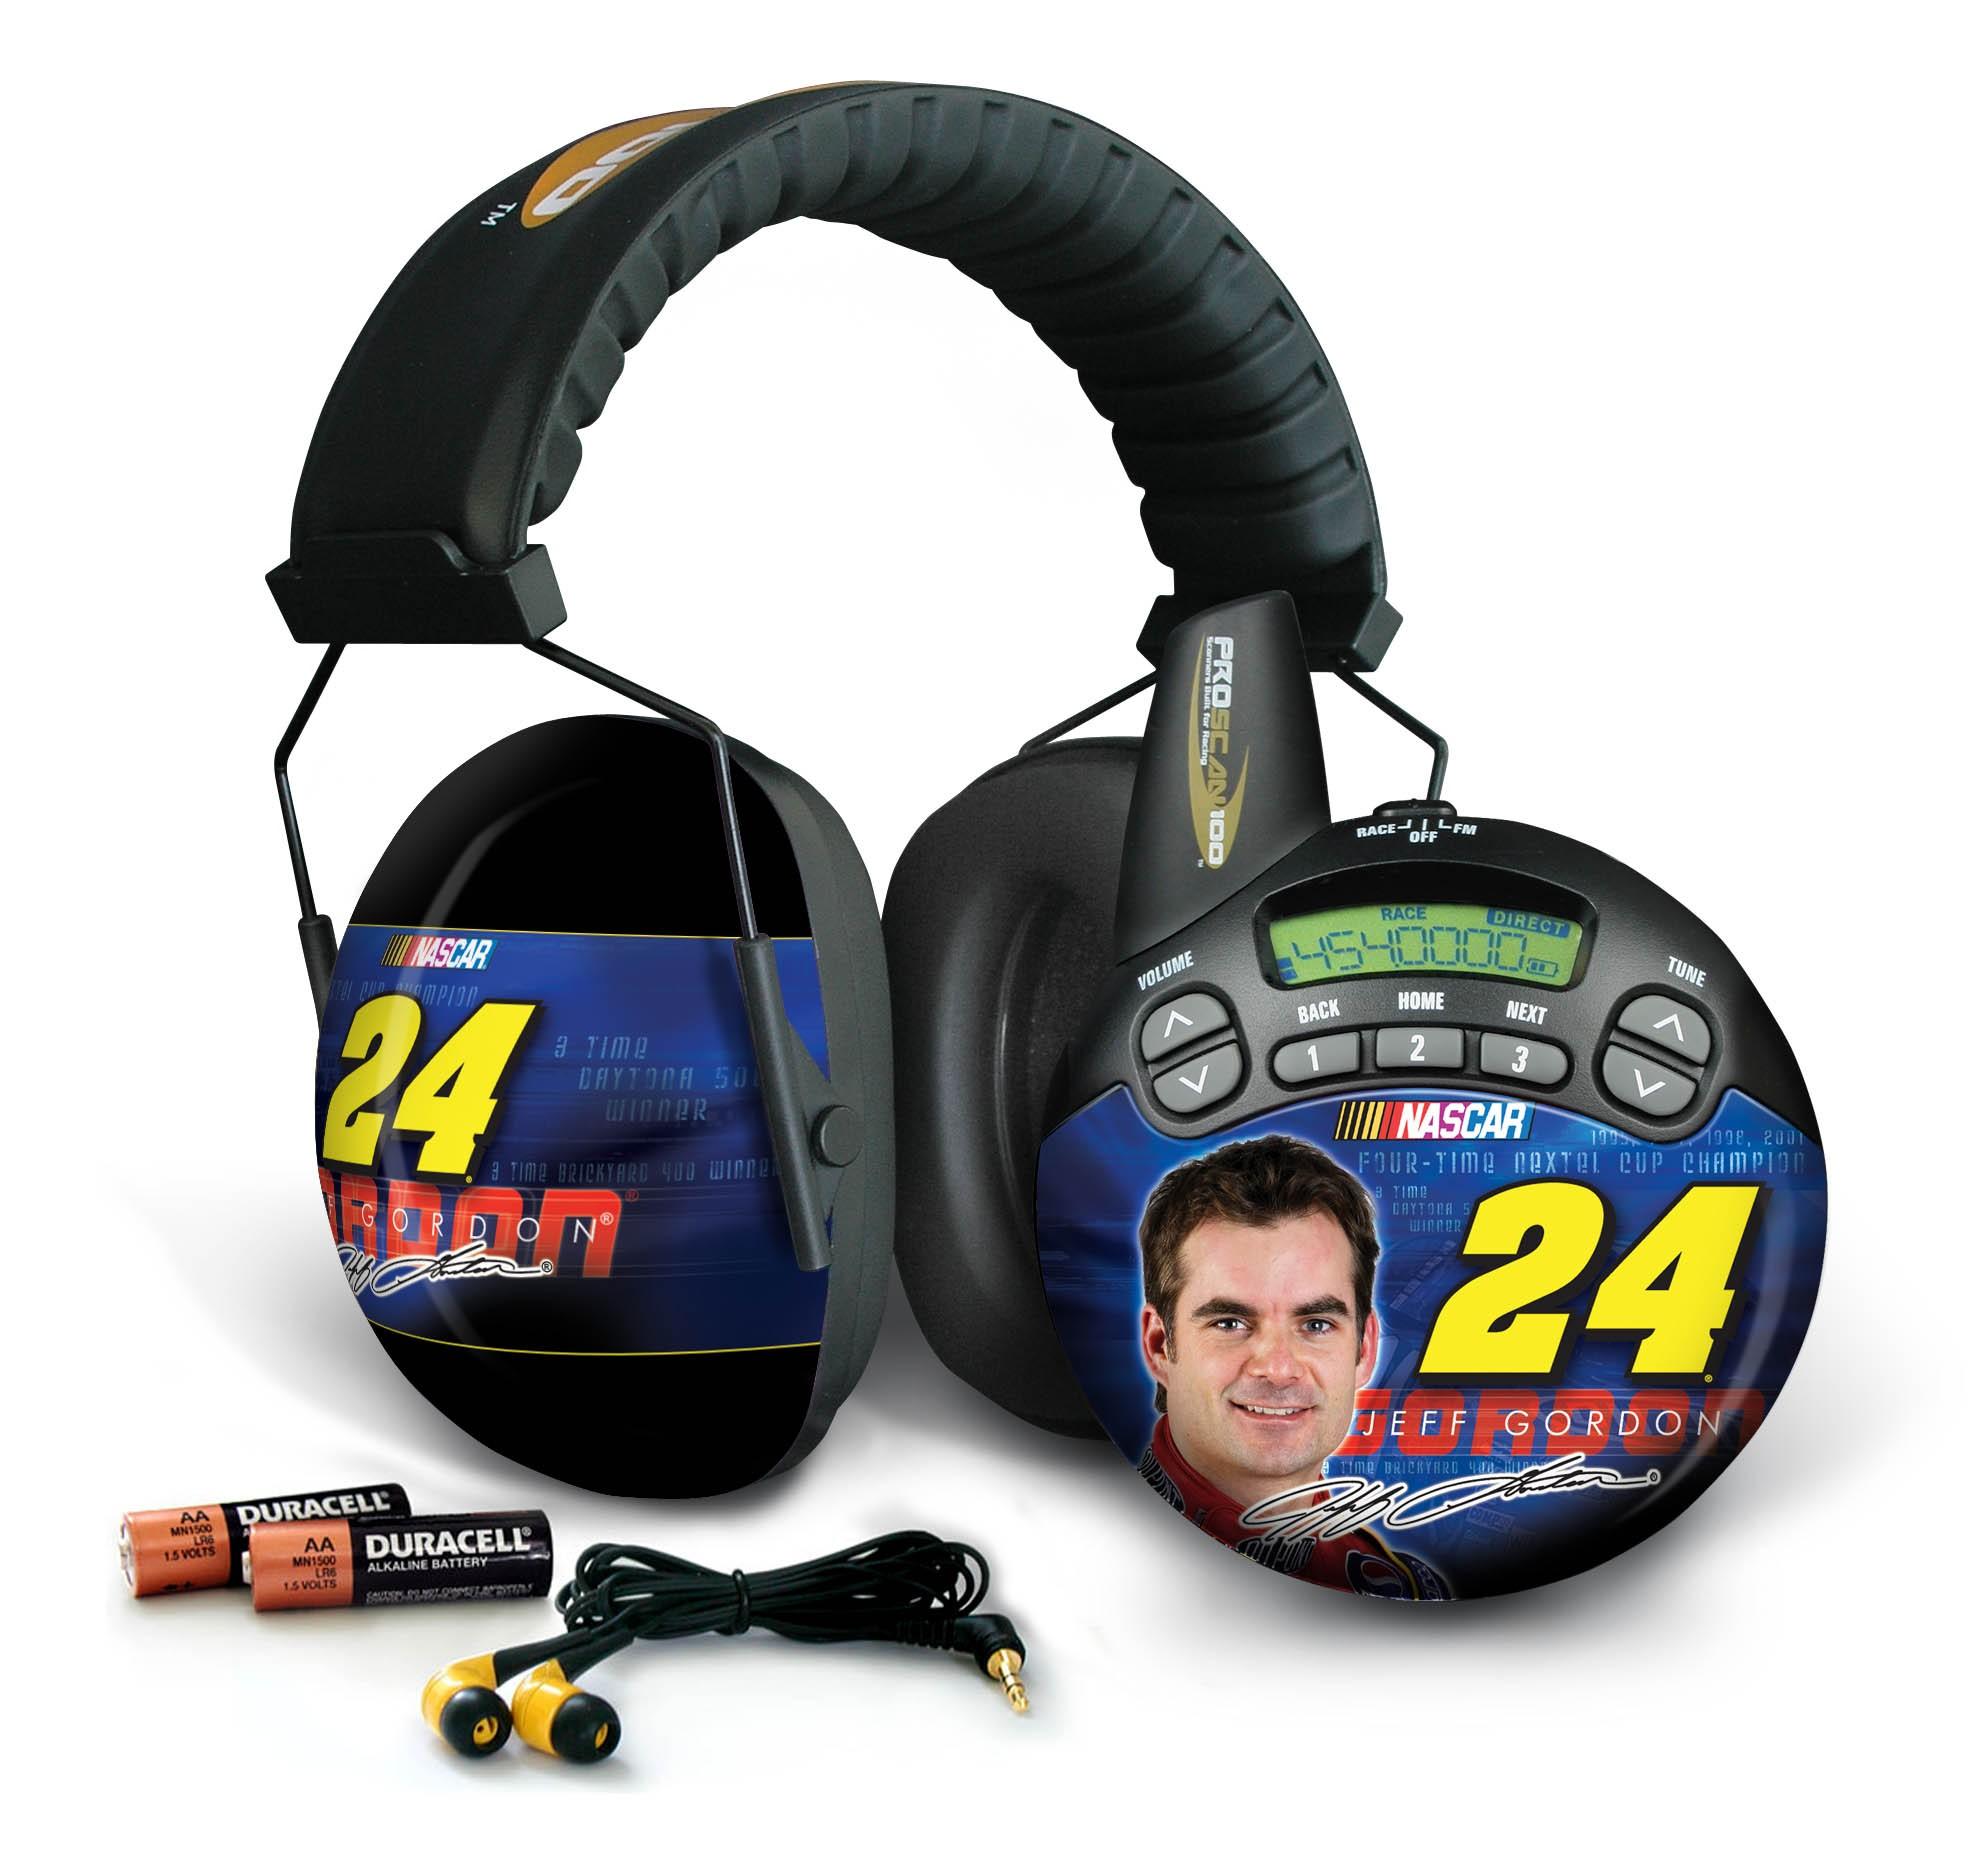 Jeff Gordon #24  Nascar ProScan 100 Trackside Scanner and Earmuff